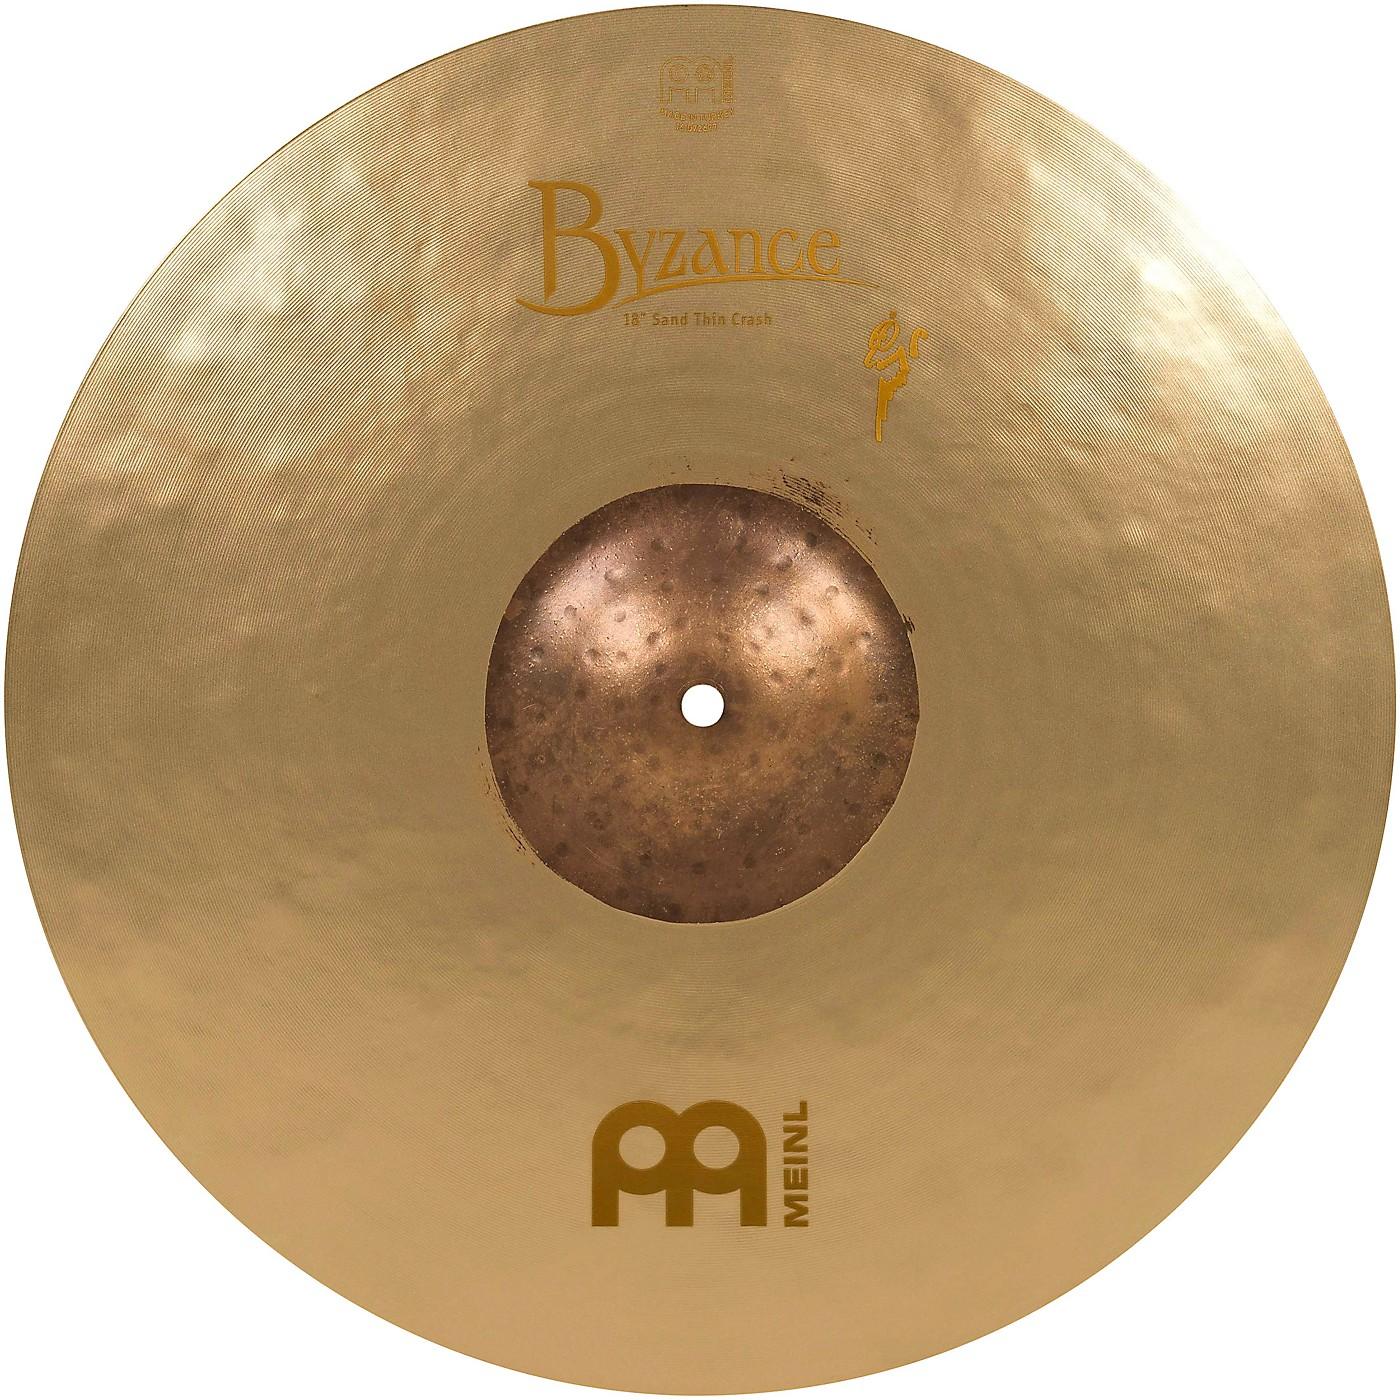 Meinl Byzance Vintage Series Benny Greb Sand Thin Crash Cymbal thumbnail